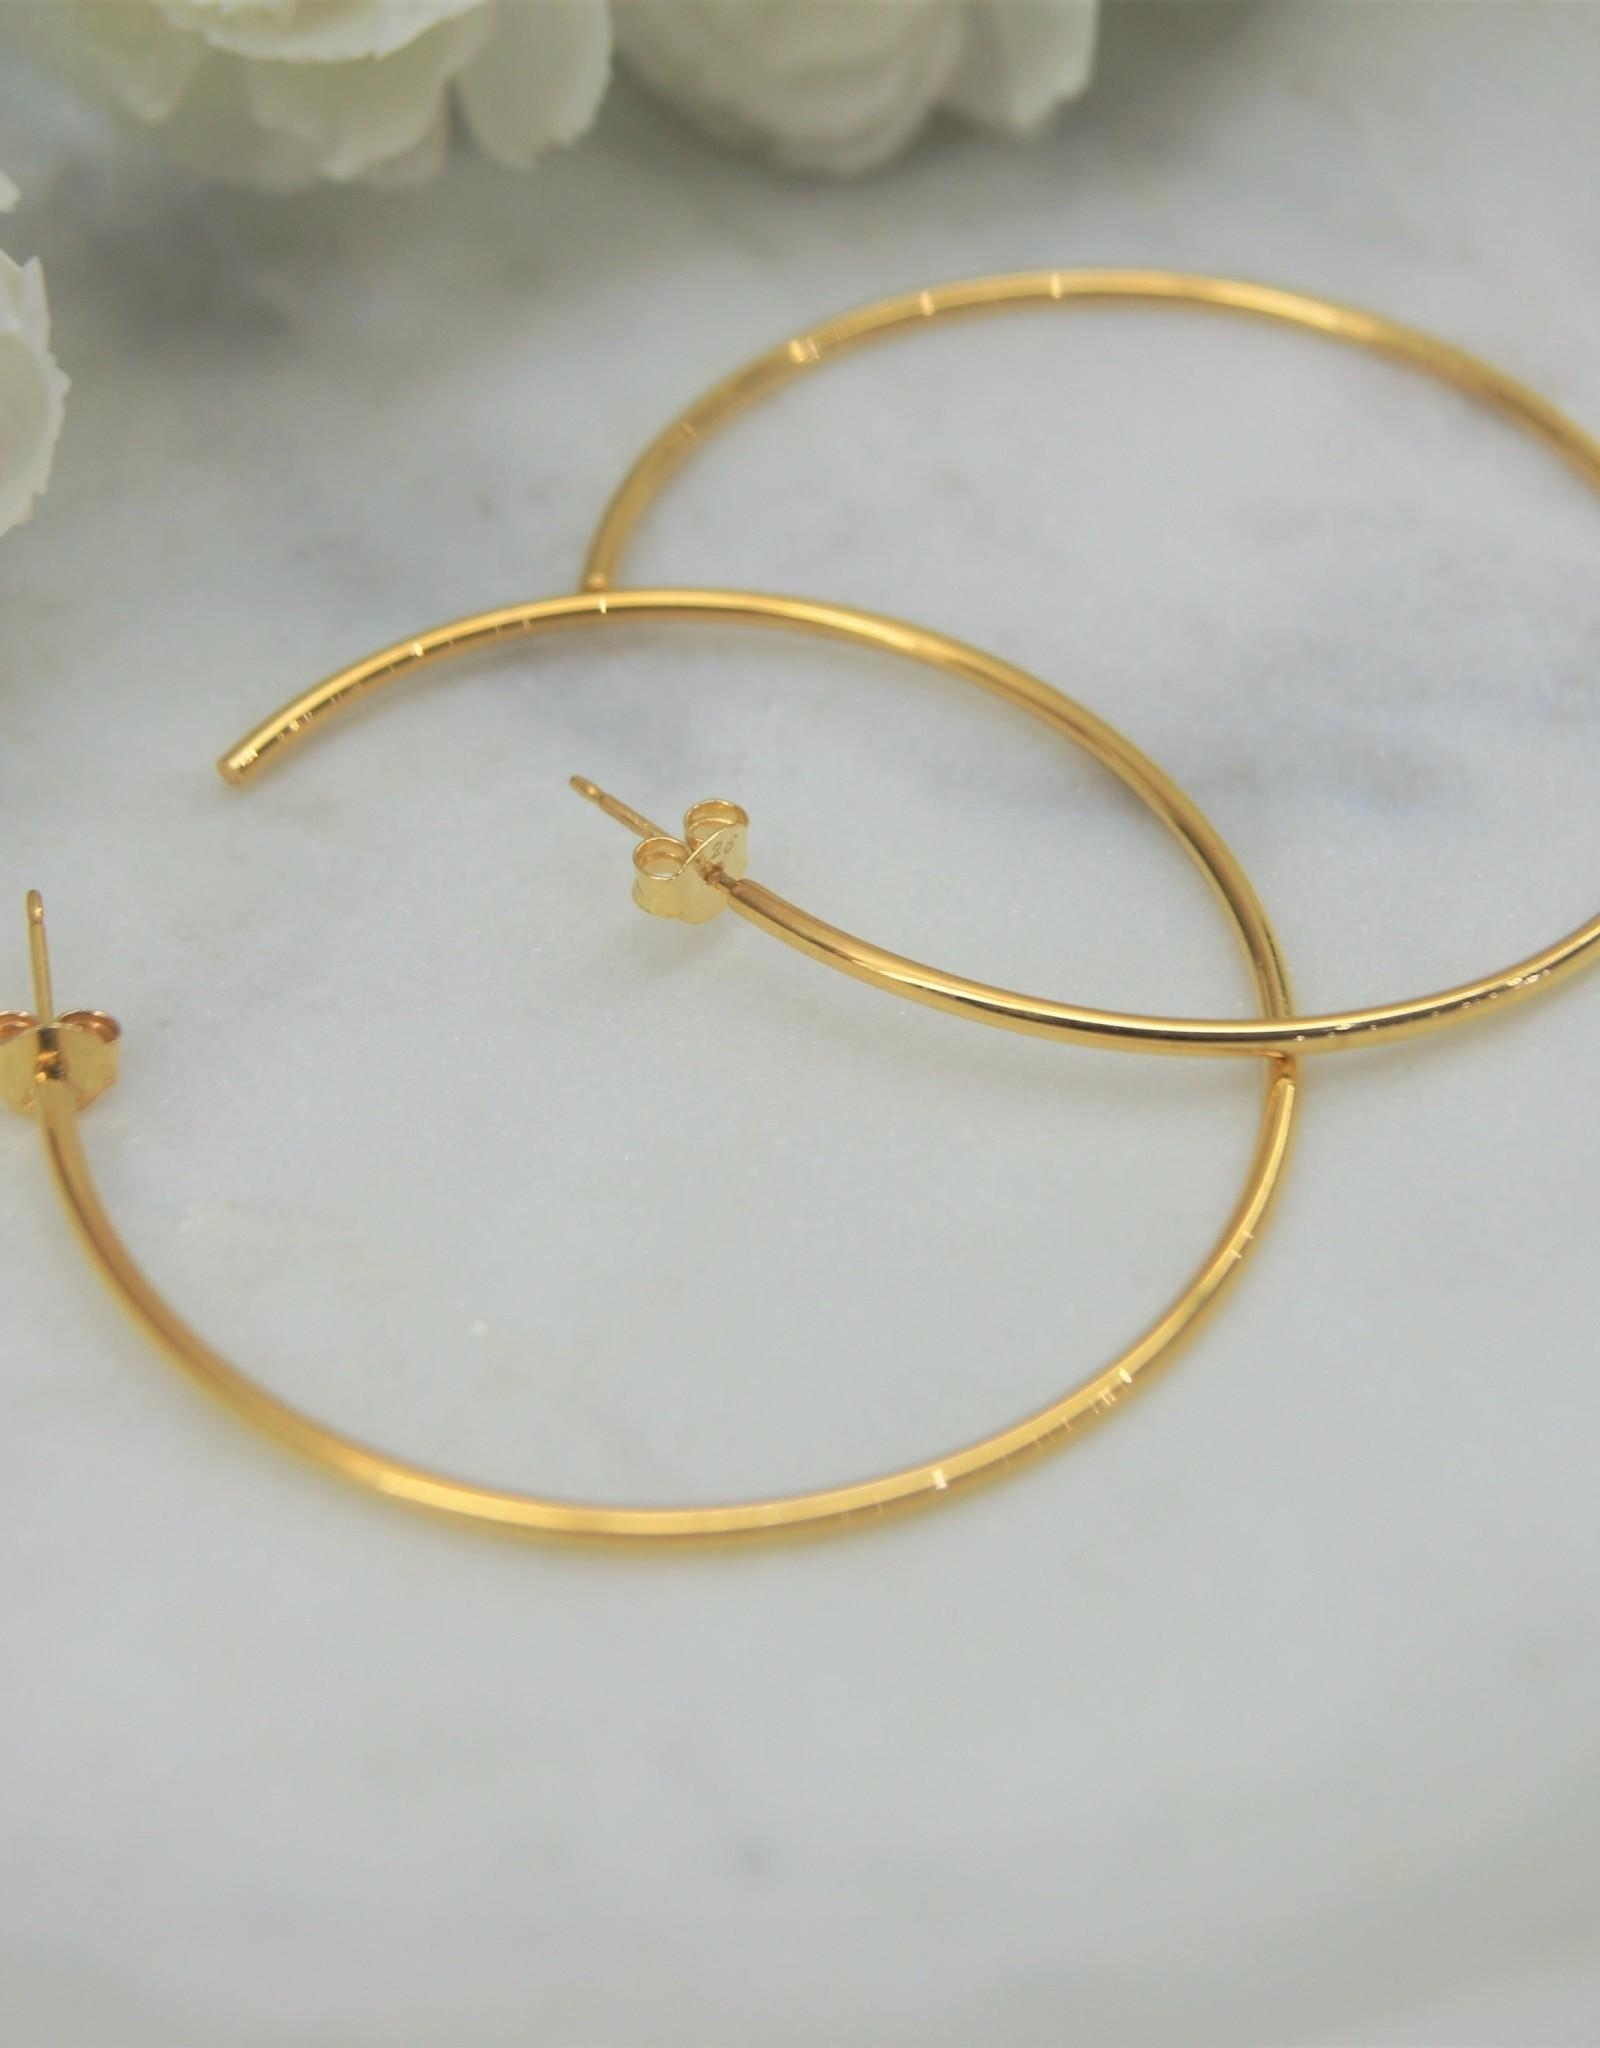 Tashi 50mm Thin Tube Hoop Earrings - Gold Vermeil